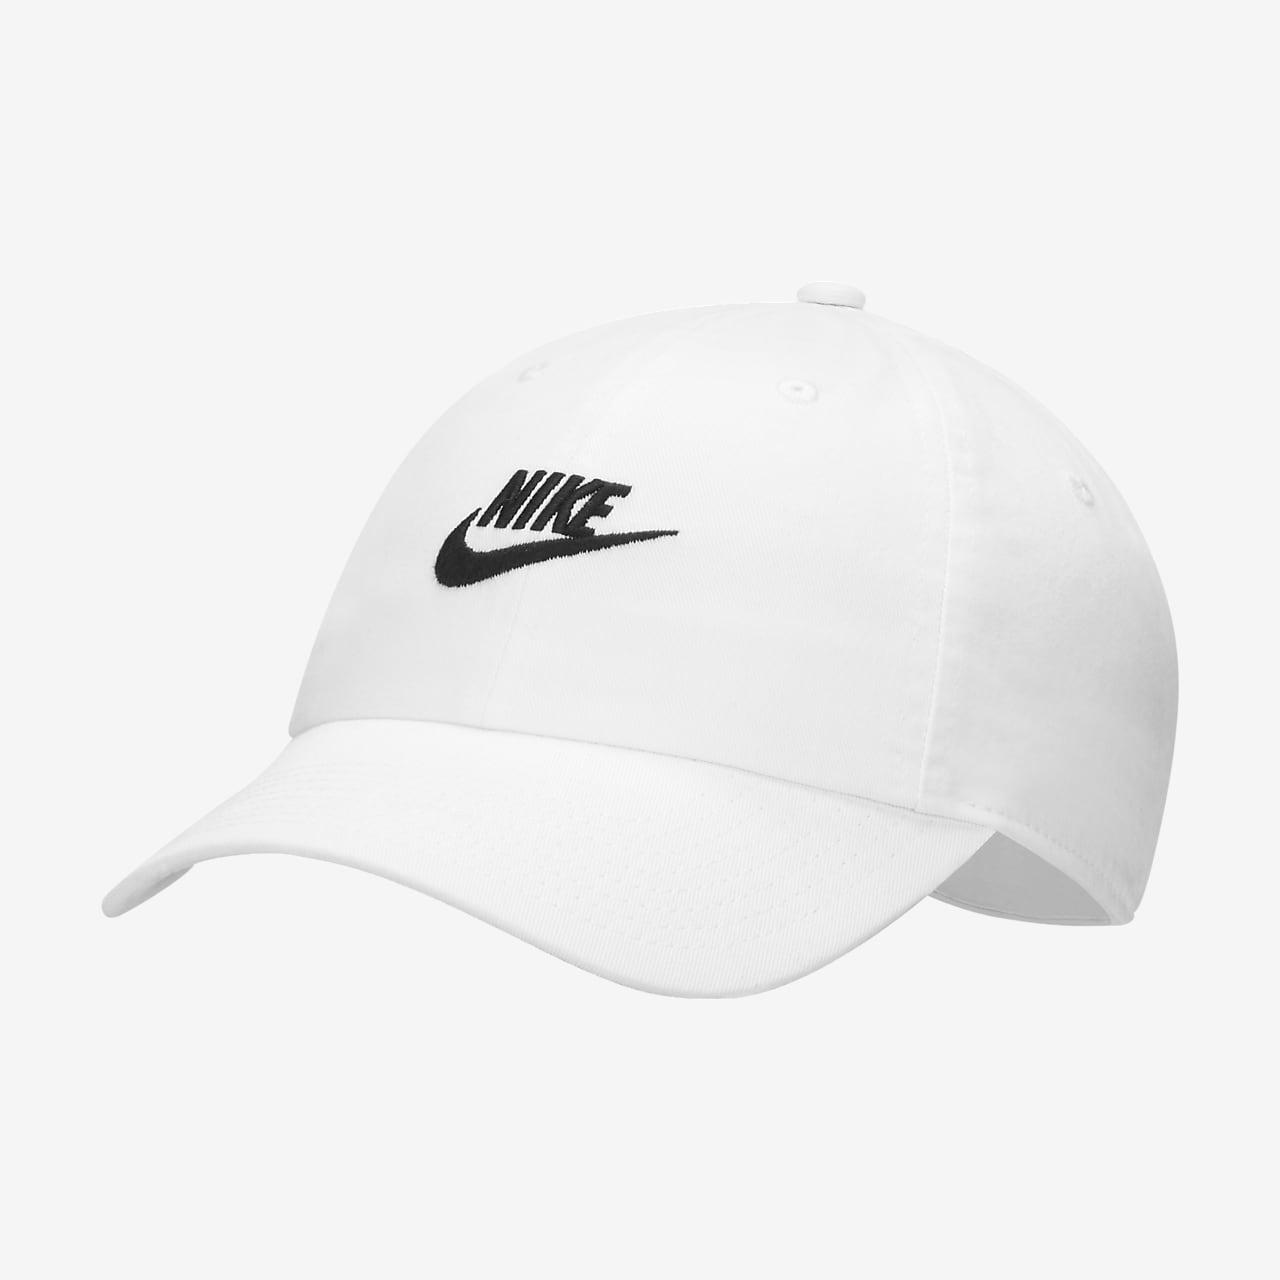 2b6dcb3278f594 Nike Sportswear Heritage 86 Adjustable Hat. Nike.com SA